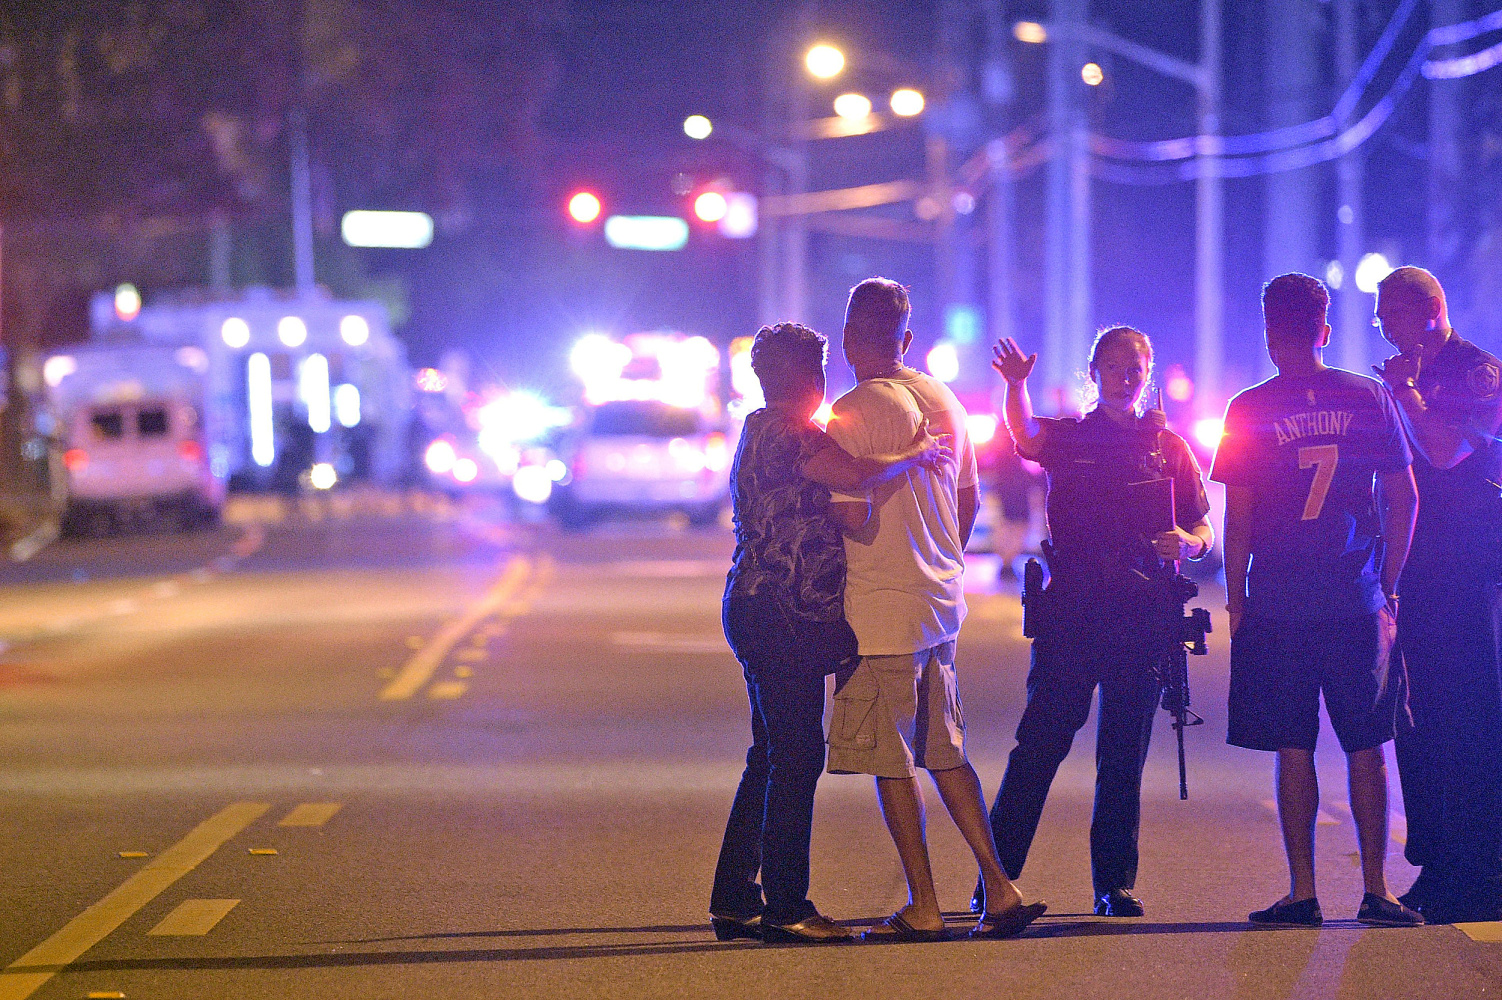 Orlando Nightclub Shooting: Mass Casualties After Gunman Opens Fire in Gay Club